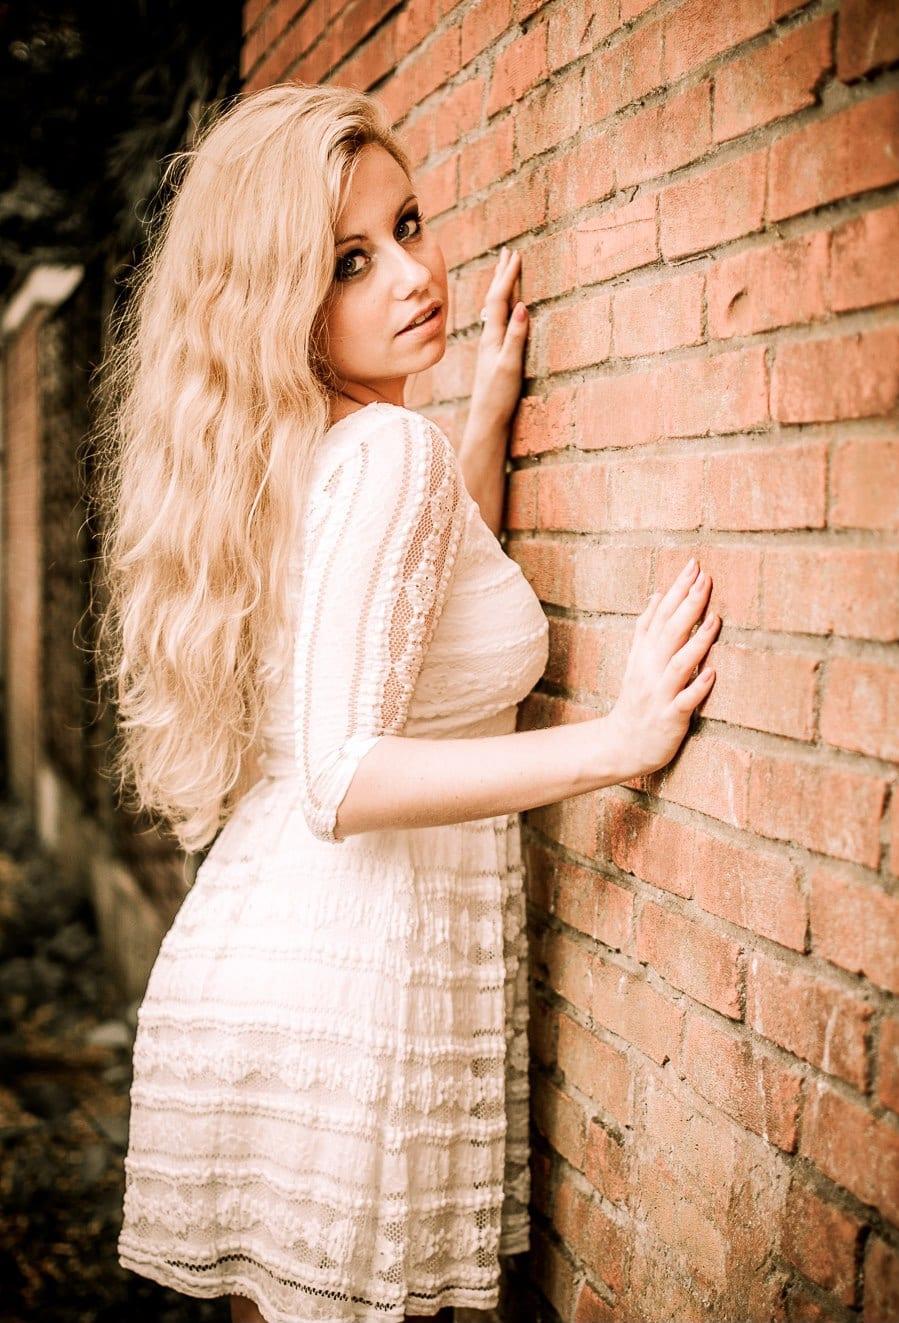 portret-fotografie-fotoshoot-arnhem-fotograaf